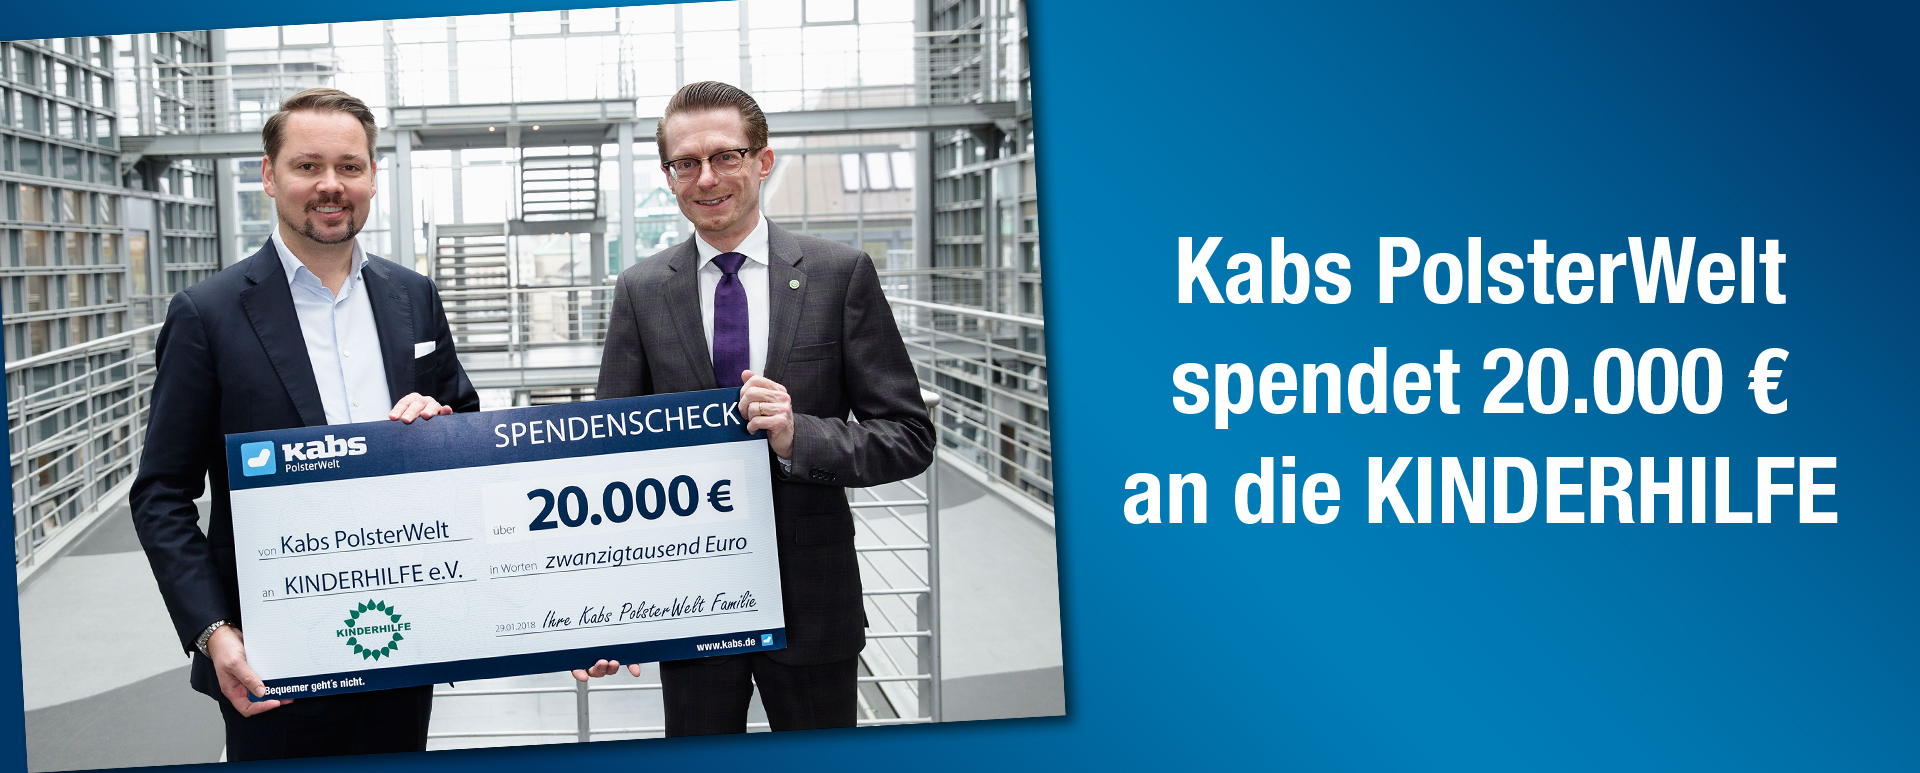 Aktion - Kabs PolsterWelt spendet 20.000 € an die KINDERHILFE